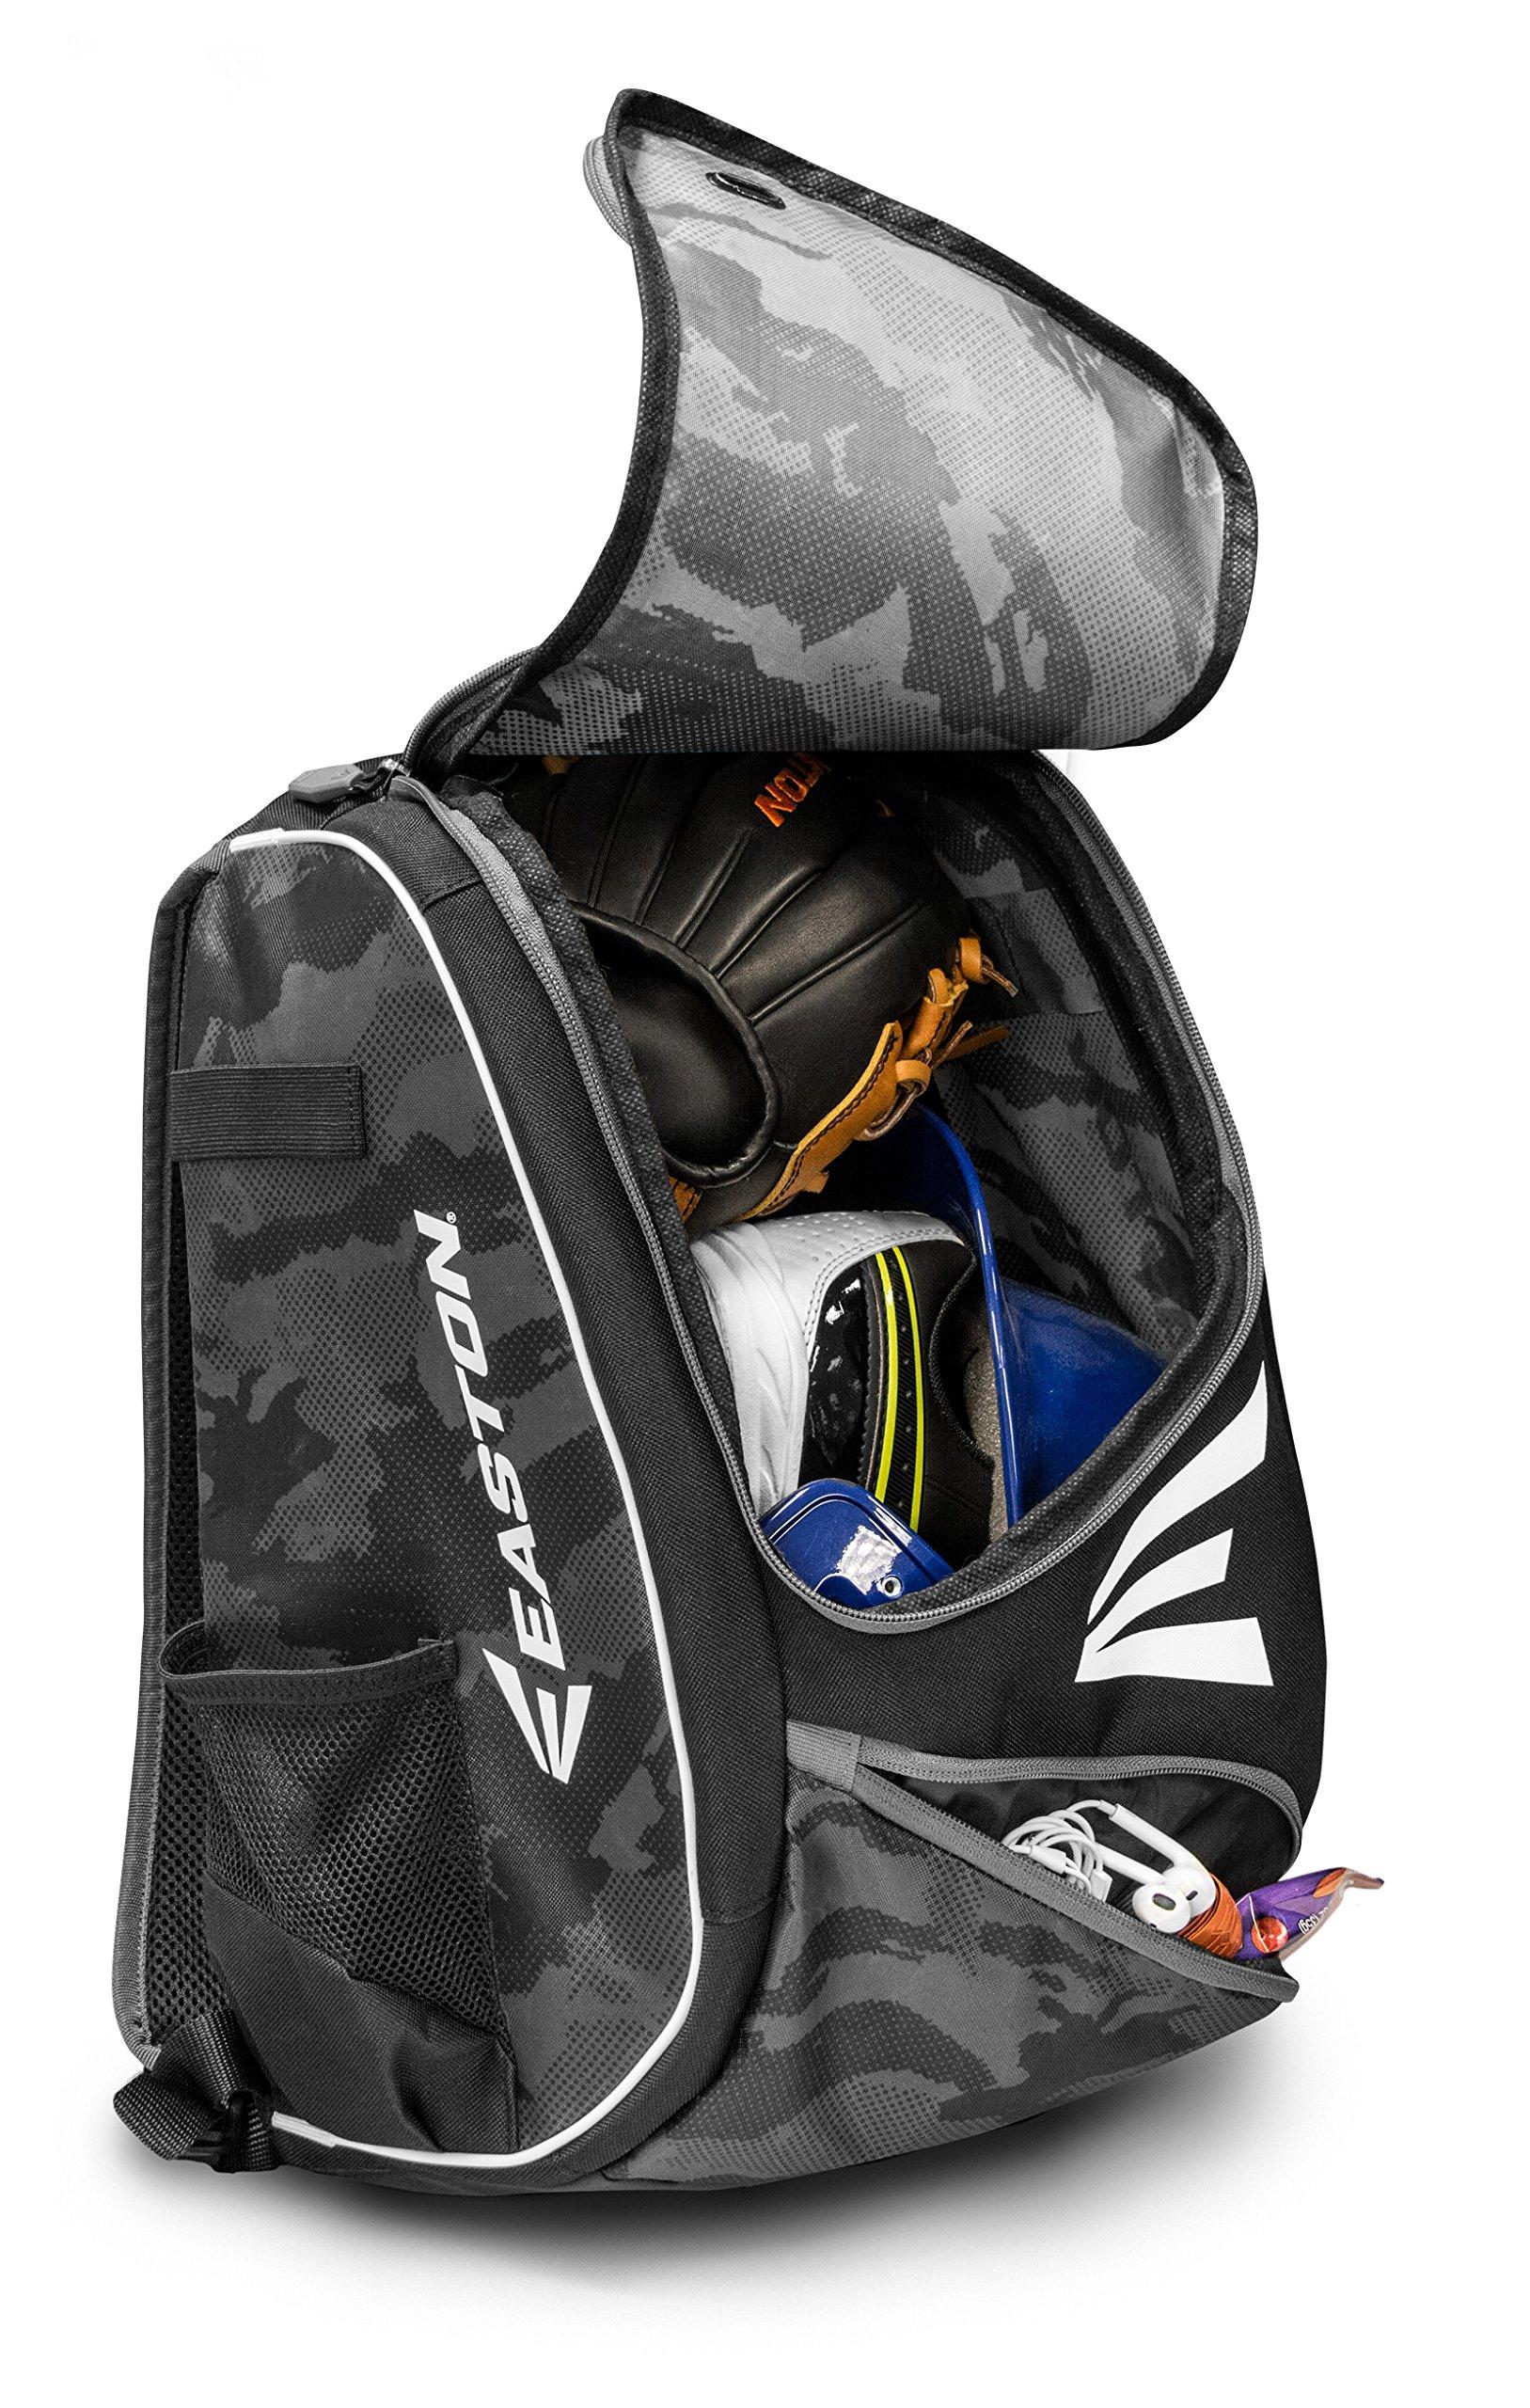 EASTON E110YBP Youth Bat & Equipment Backpack Bag | Baseball Softball | 2019 | Red White Blue | 2 Bat Sleeves | Smart Gear Storage | Valuables Pocket | Rubberized Zipper Pulls | Fence Hook by Easton (Image #1)